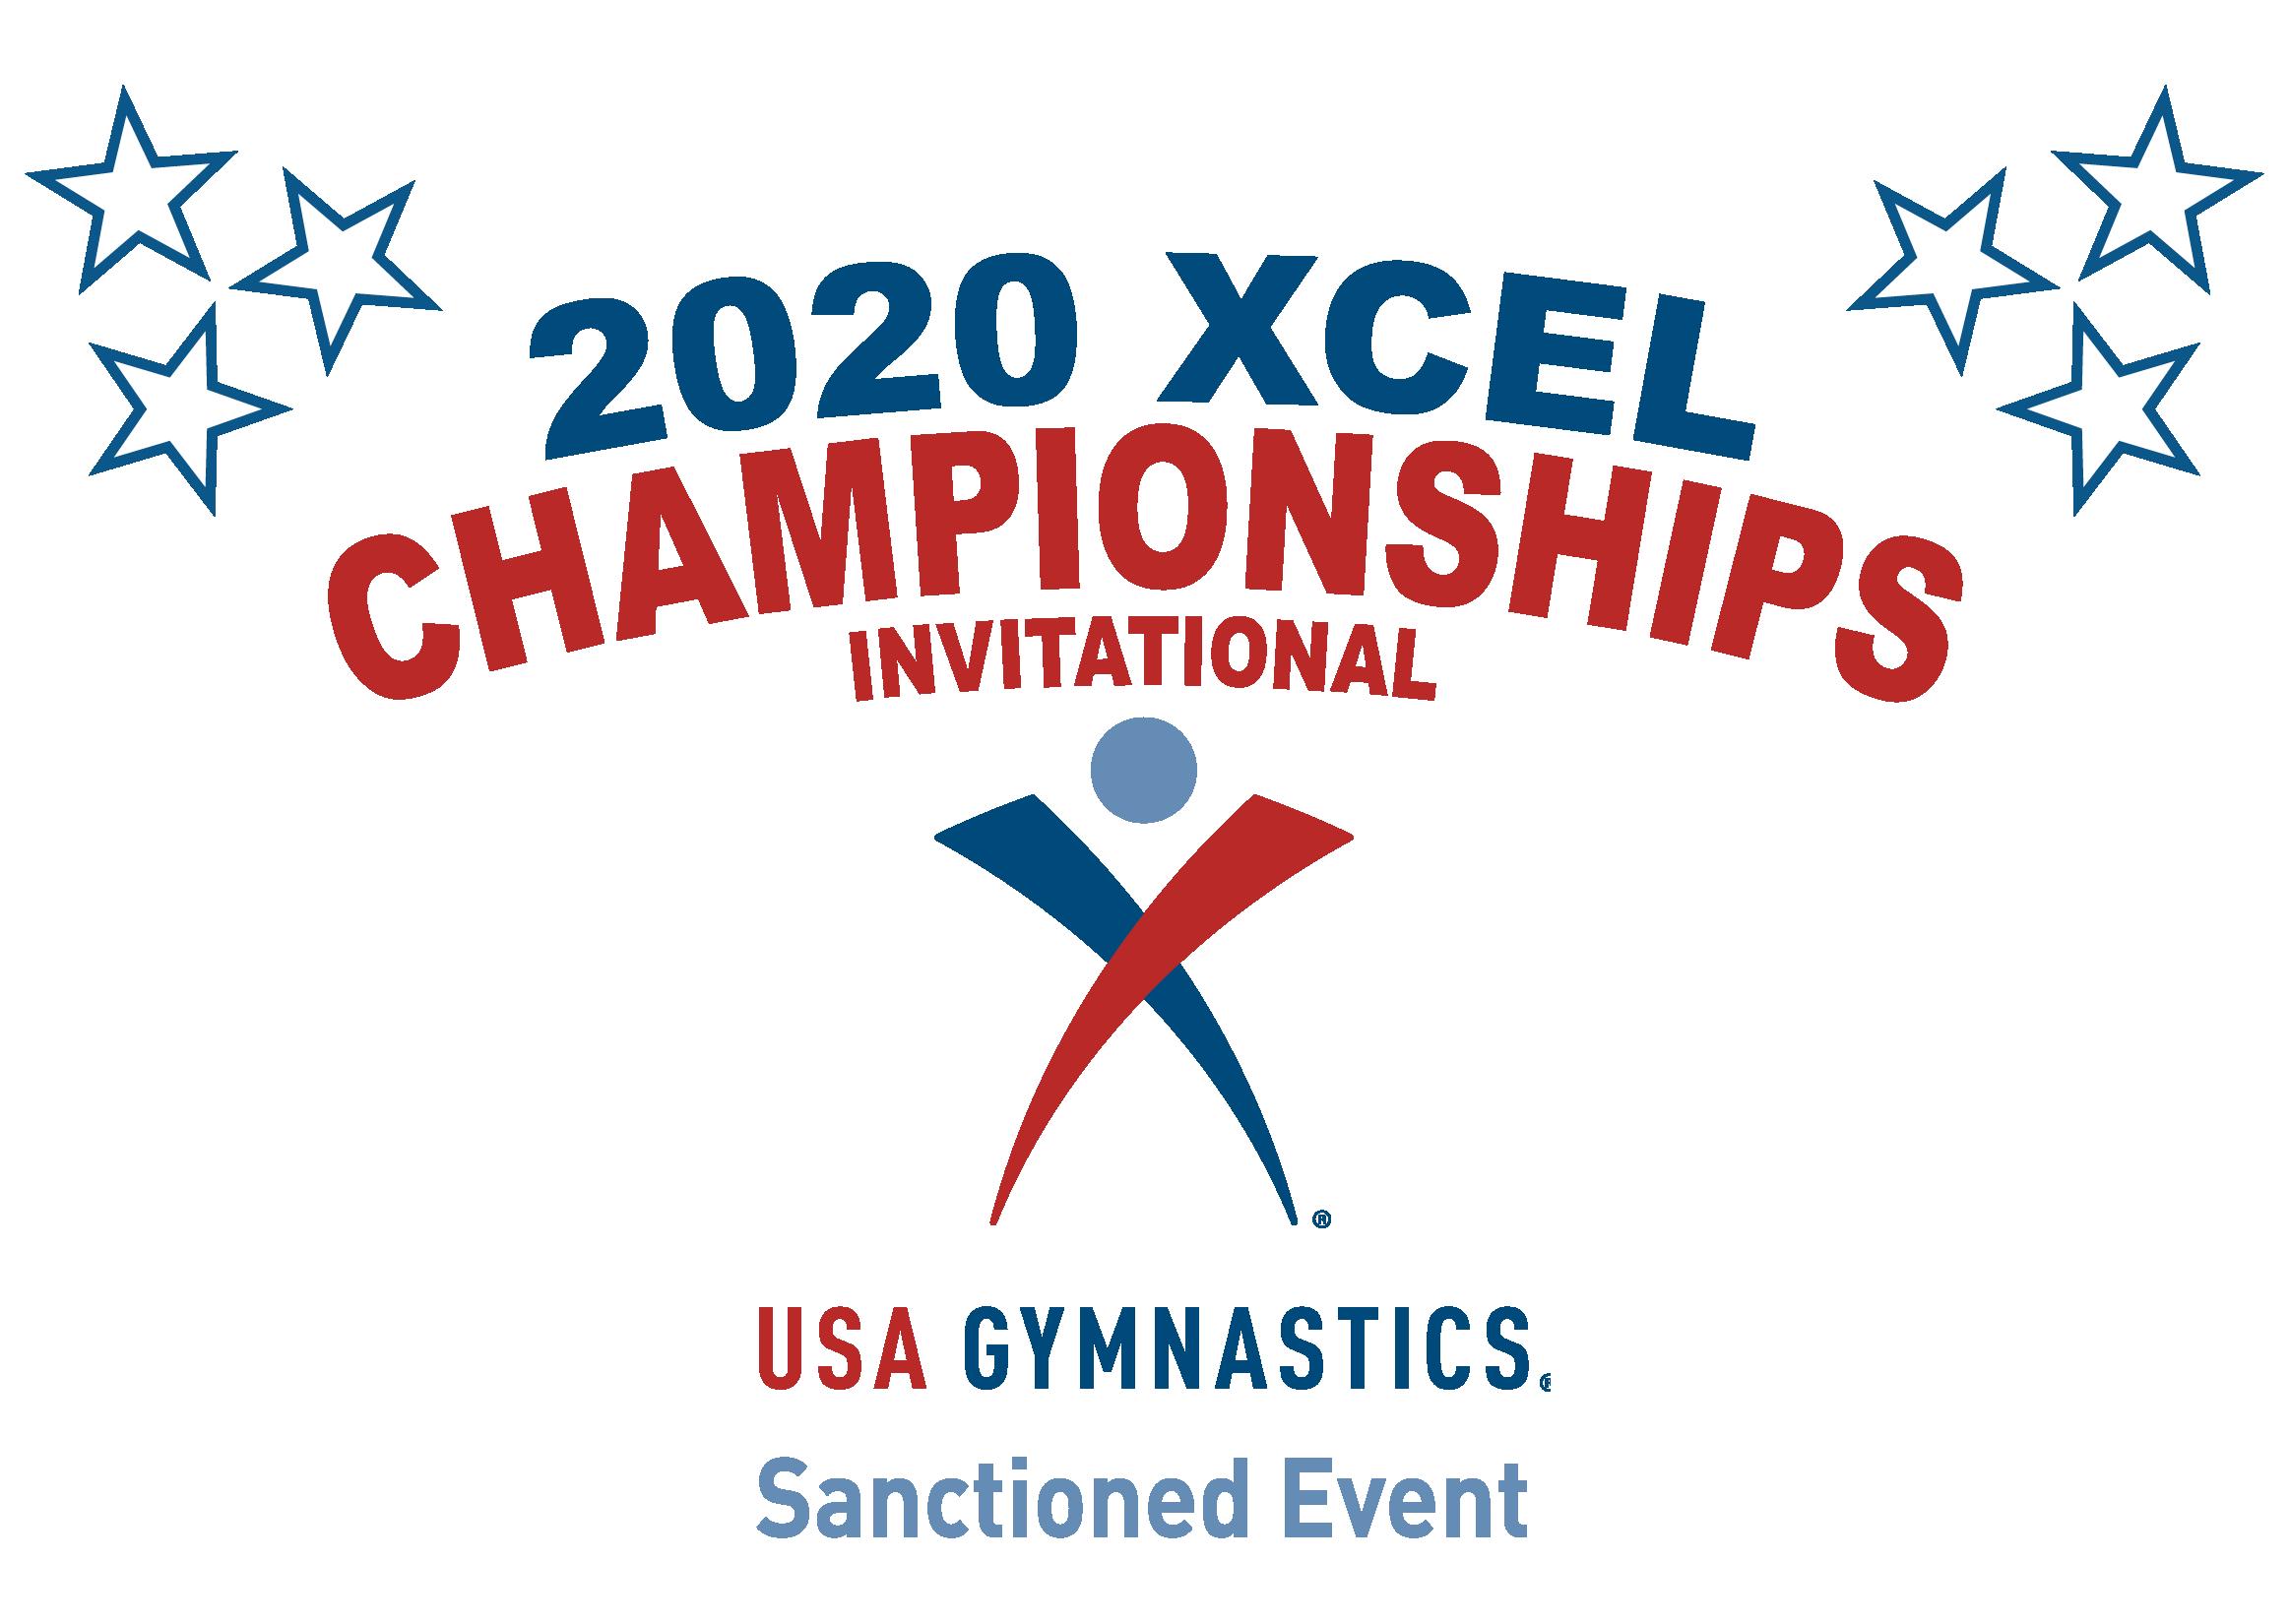 2020 XCEL Championships LOGO.png